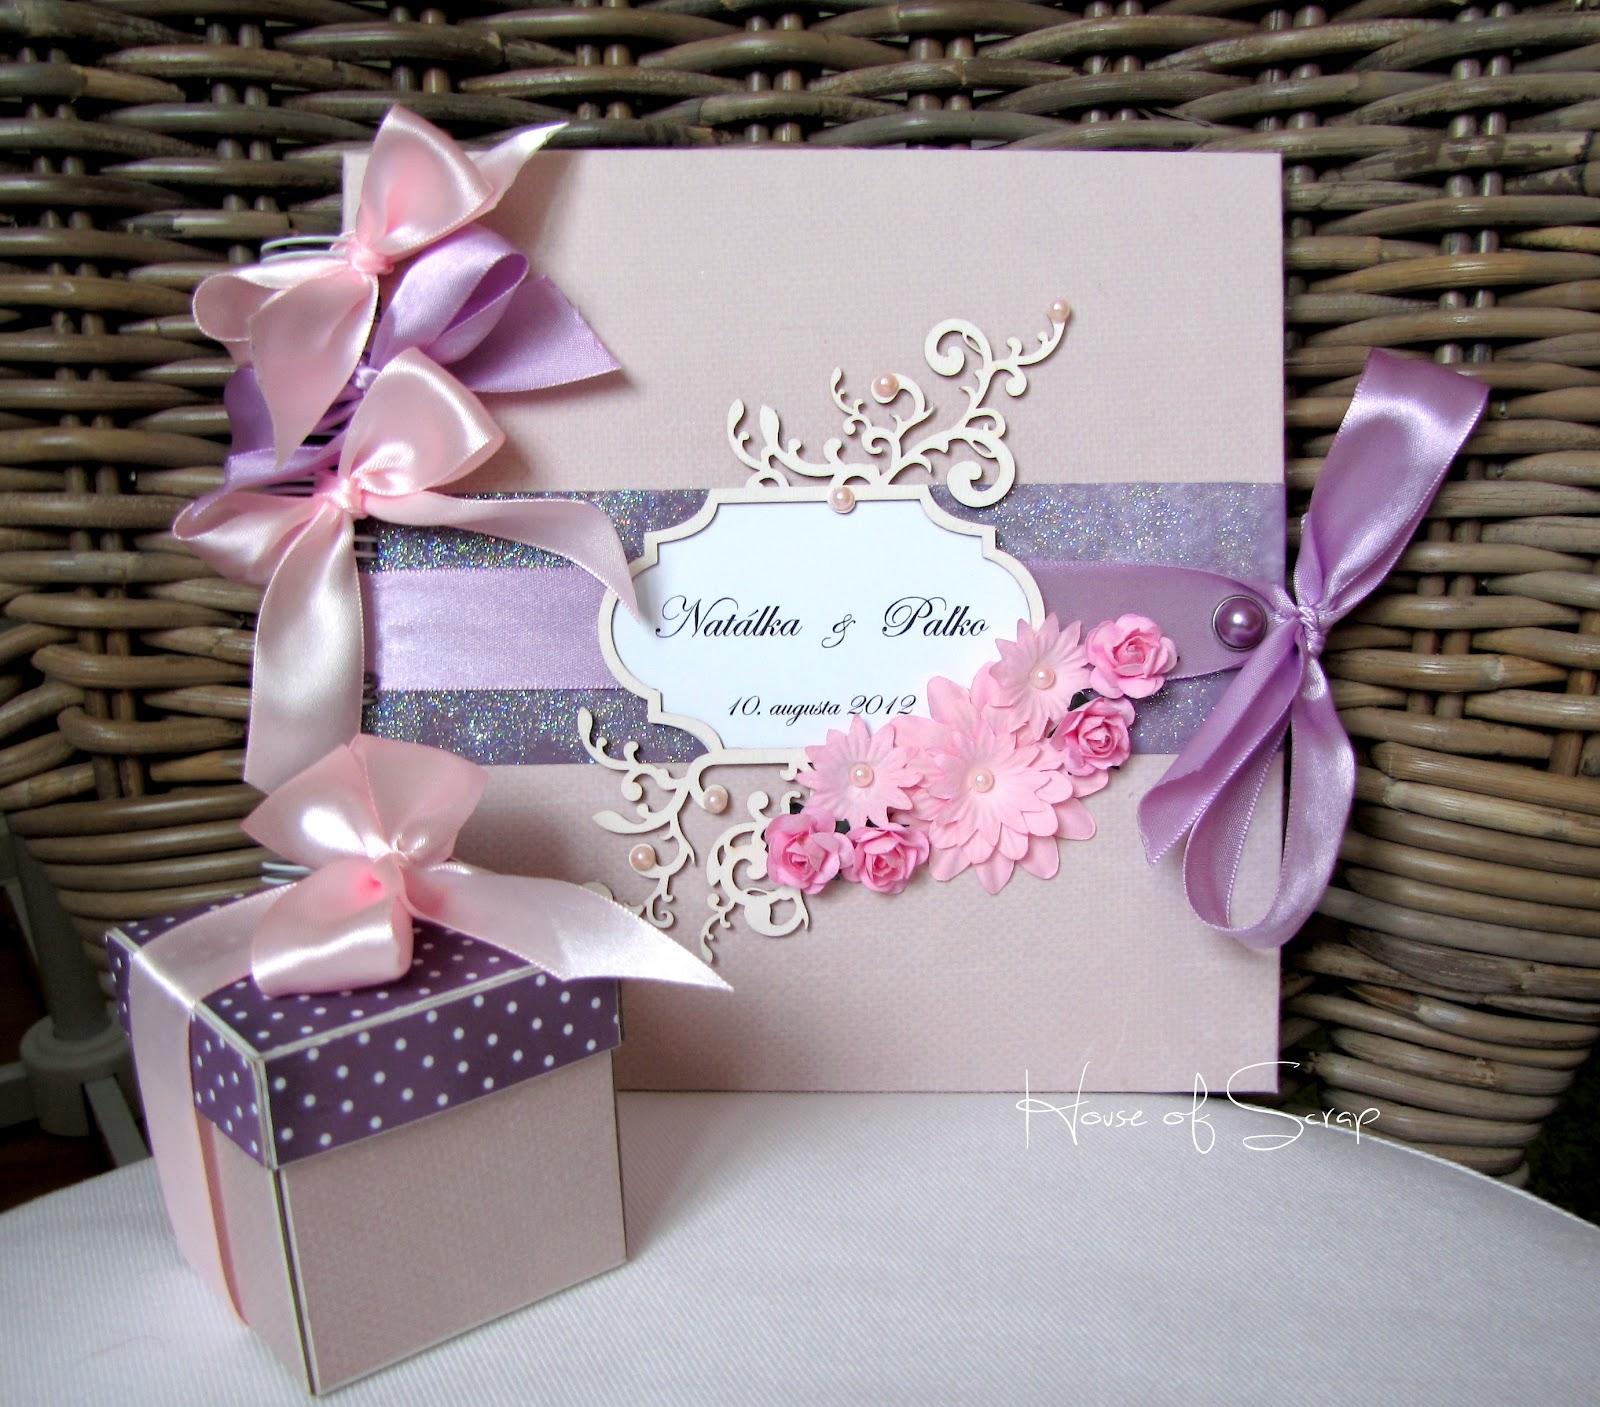 Svadobn krabika na peniaze - Krabiky na peniaze